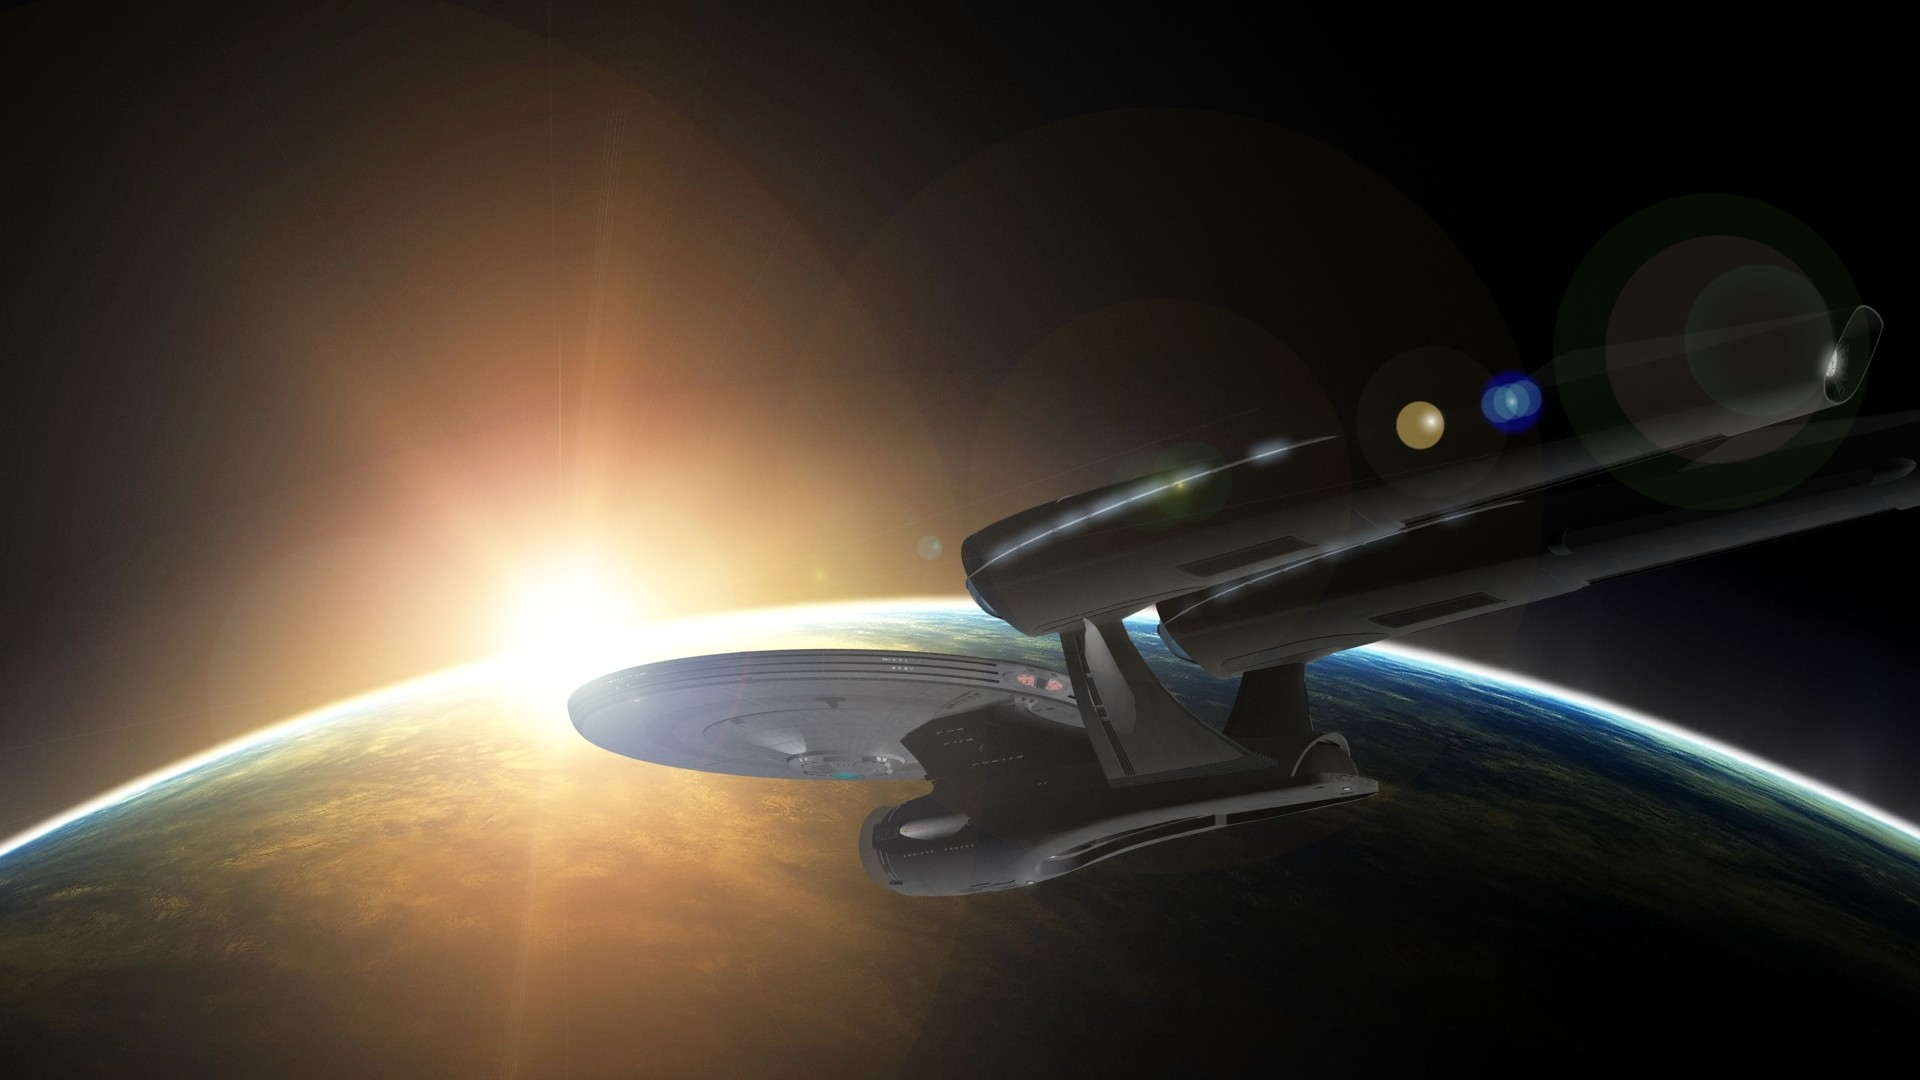 General 1920x1080 space Star Trek USS Enterprise (spaceship) Star Trek Kelvin Timeline planet sunrise orbital view